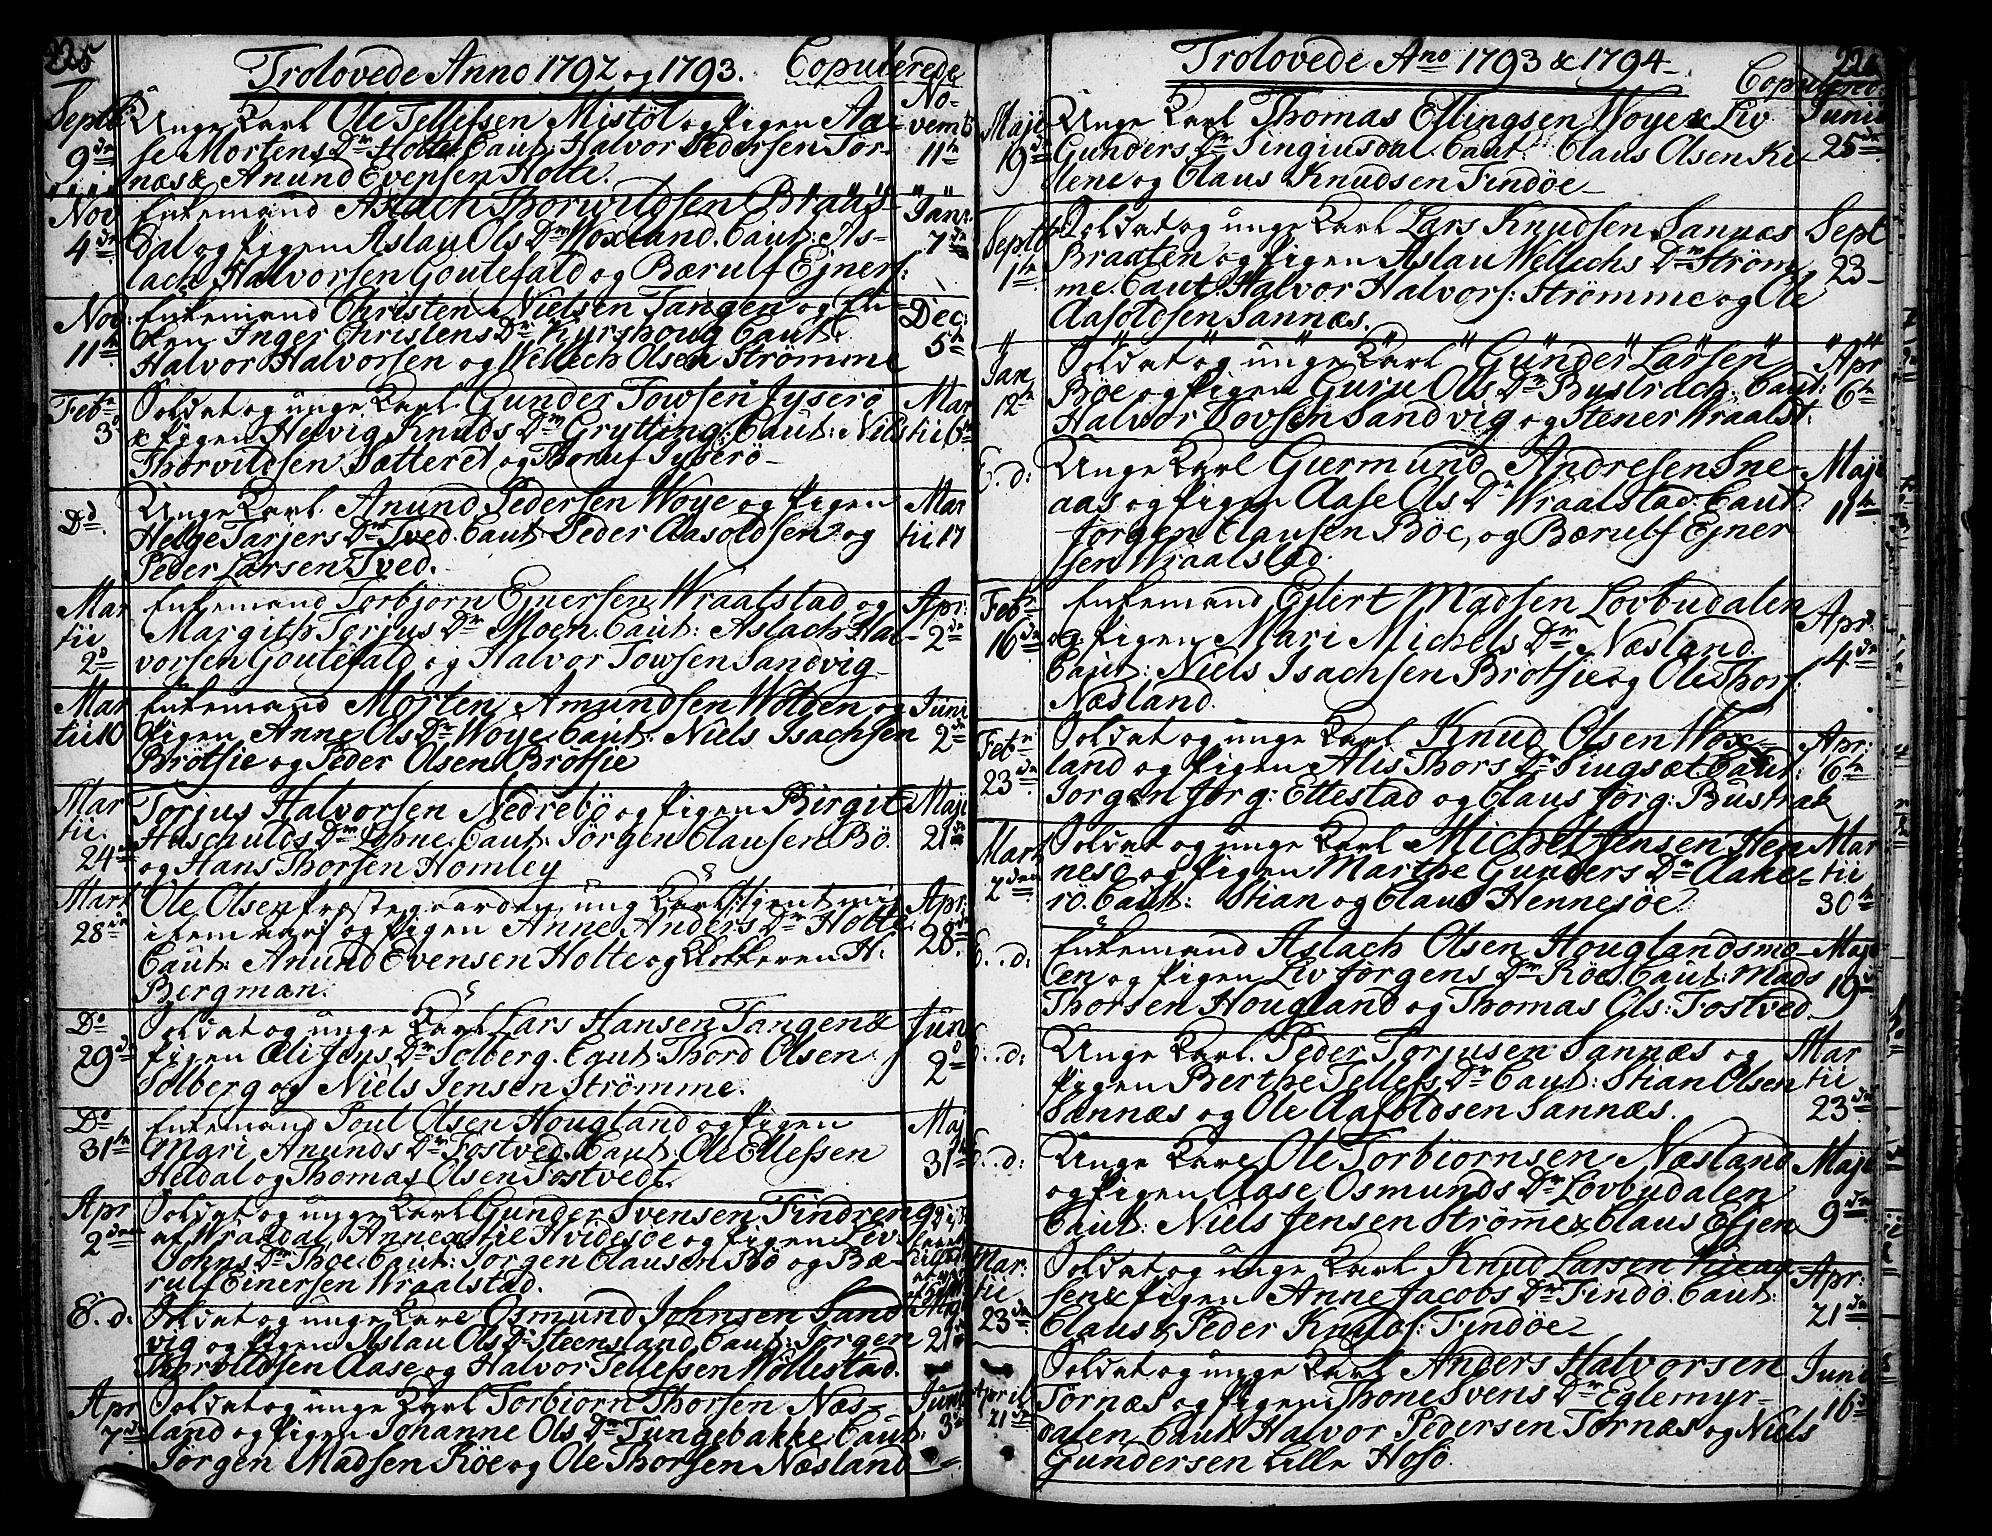 SAKO, Drangedal kirkebøker, F/Fa/L0003: Ministerialbok nr. 3, 1768-1814, s. 225-226